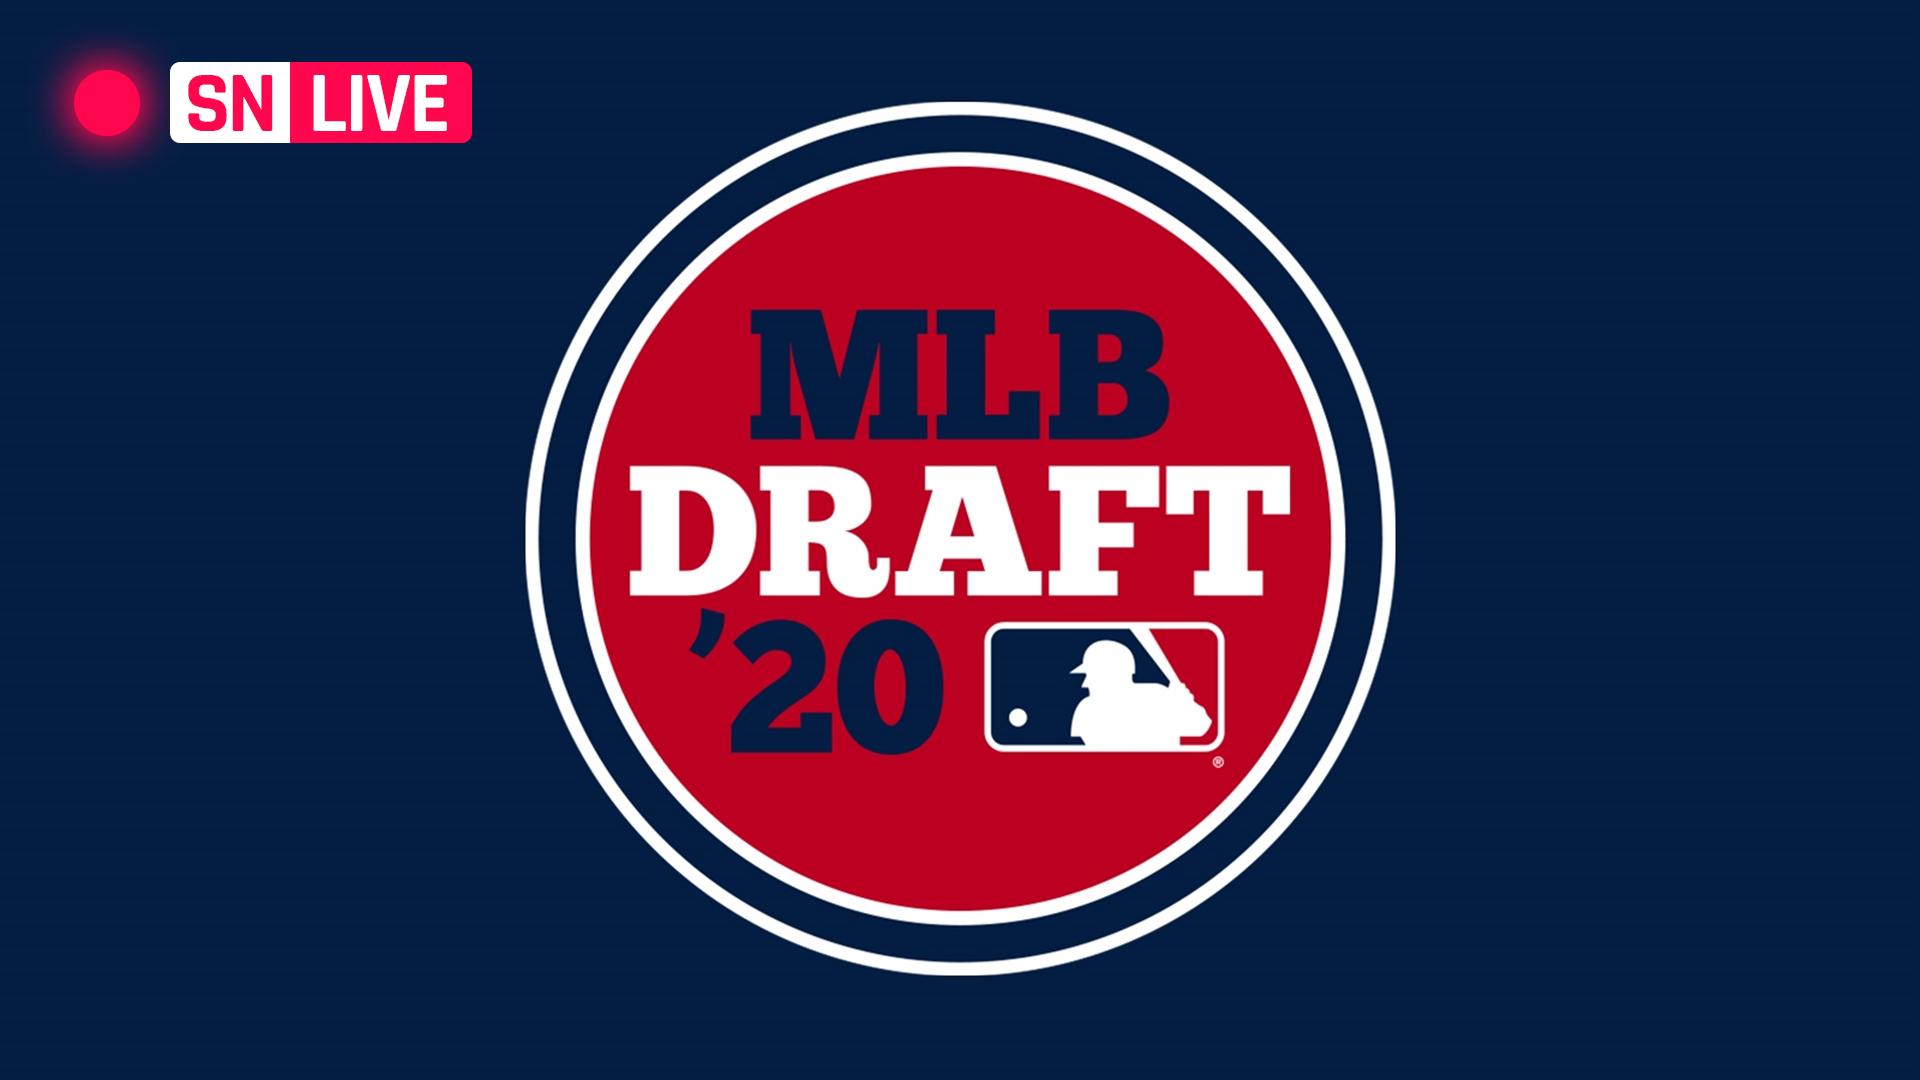 MLB Draft tracker 2020: Live results, complete picks list for Rounds 1-5 in baseball draft 1